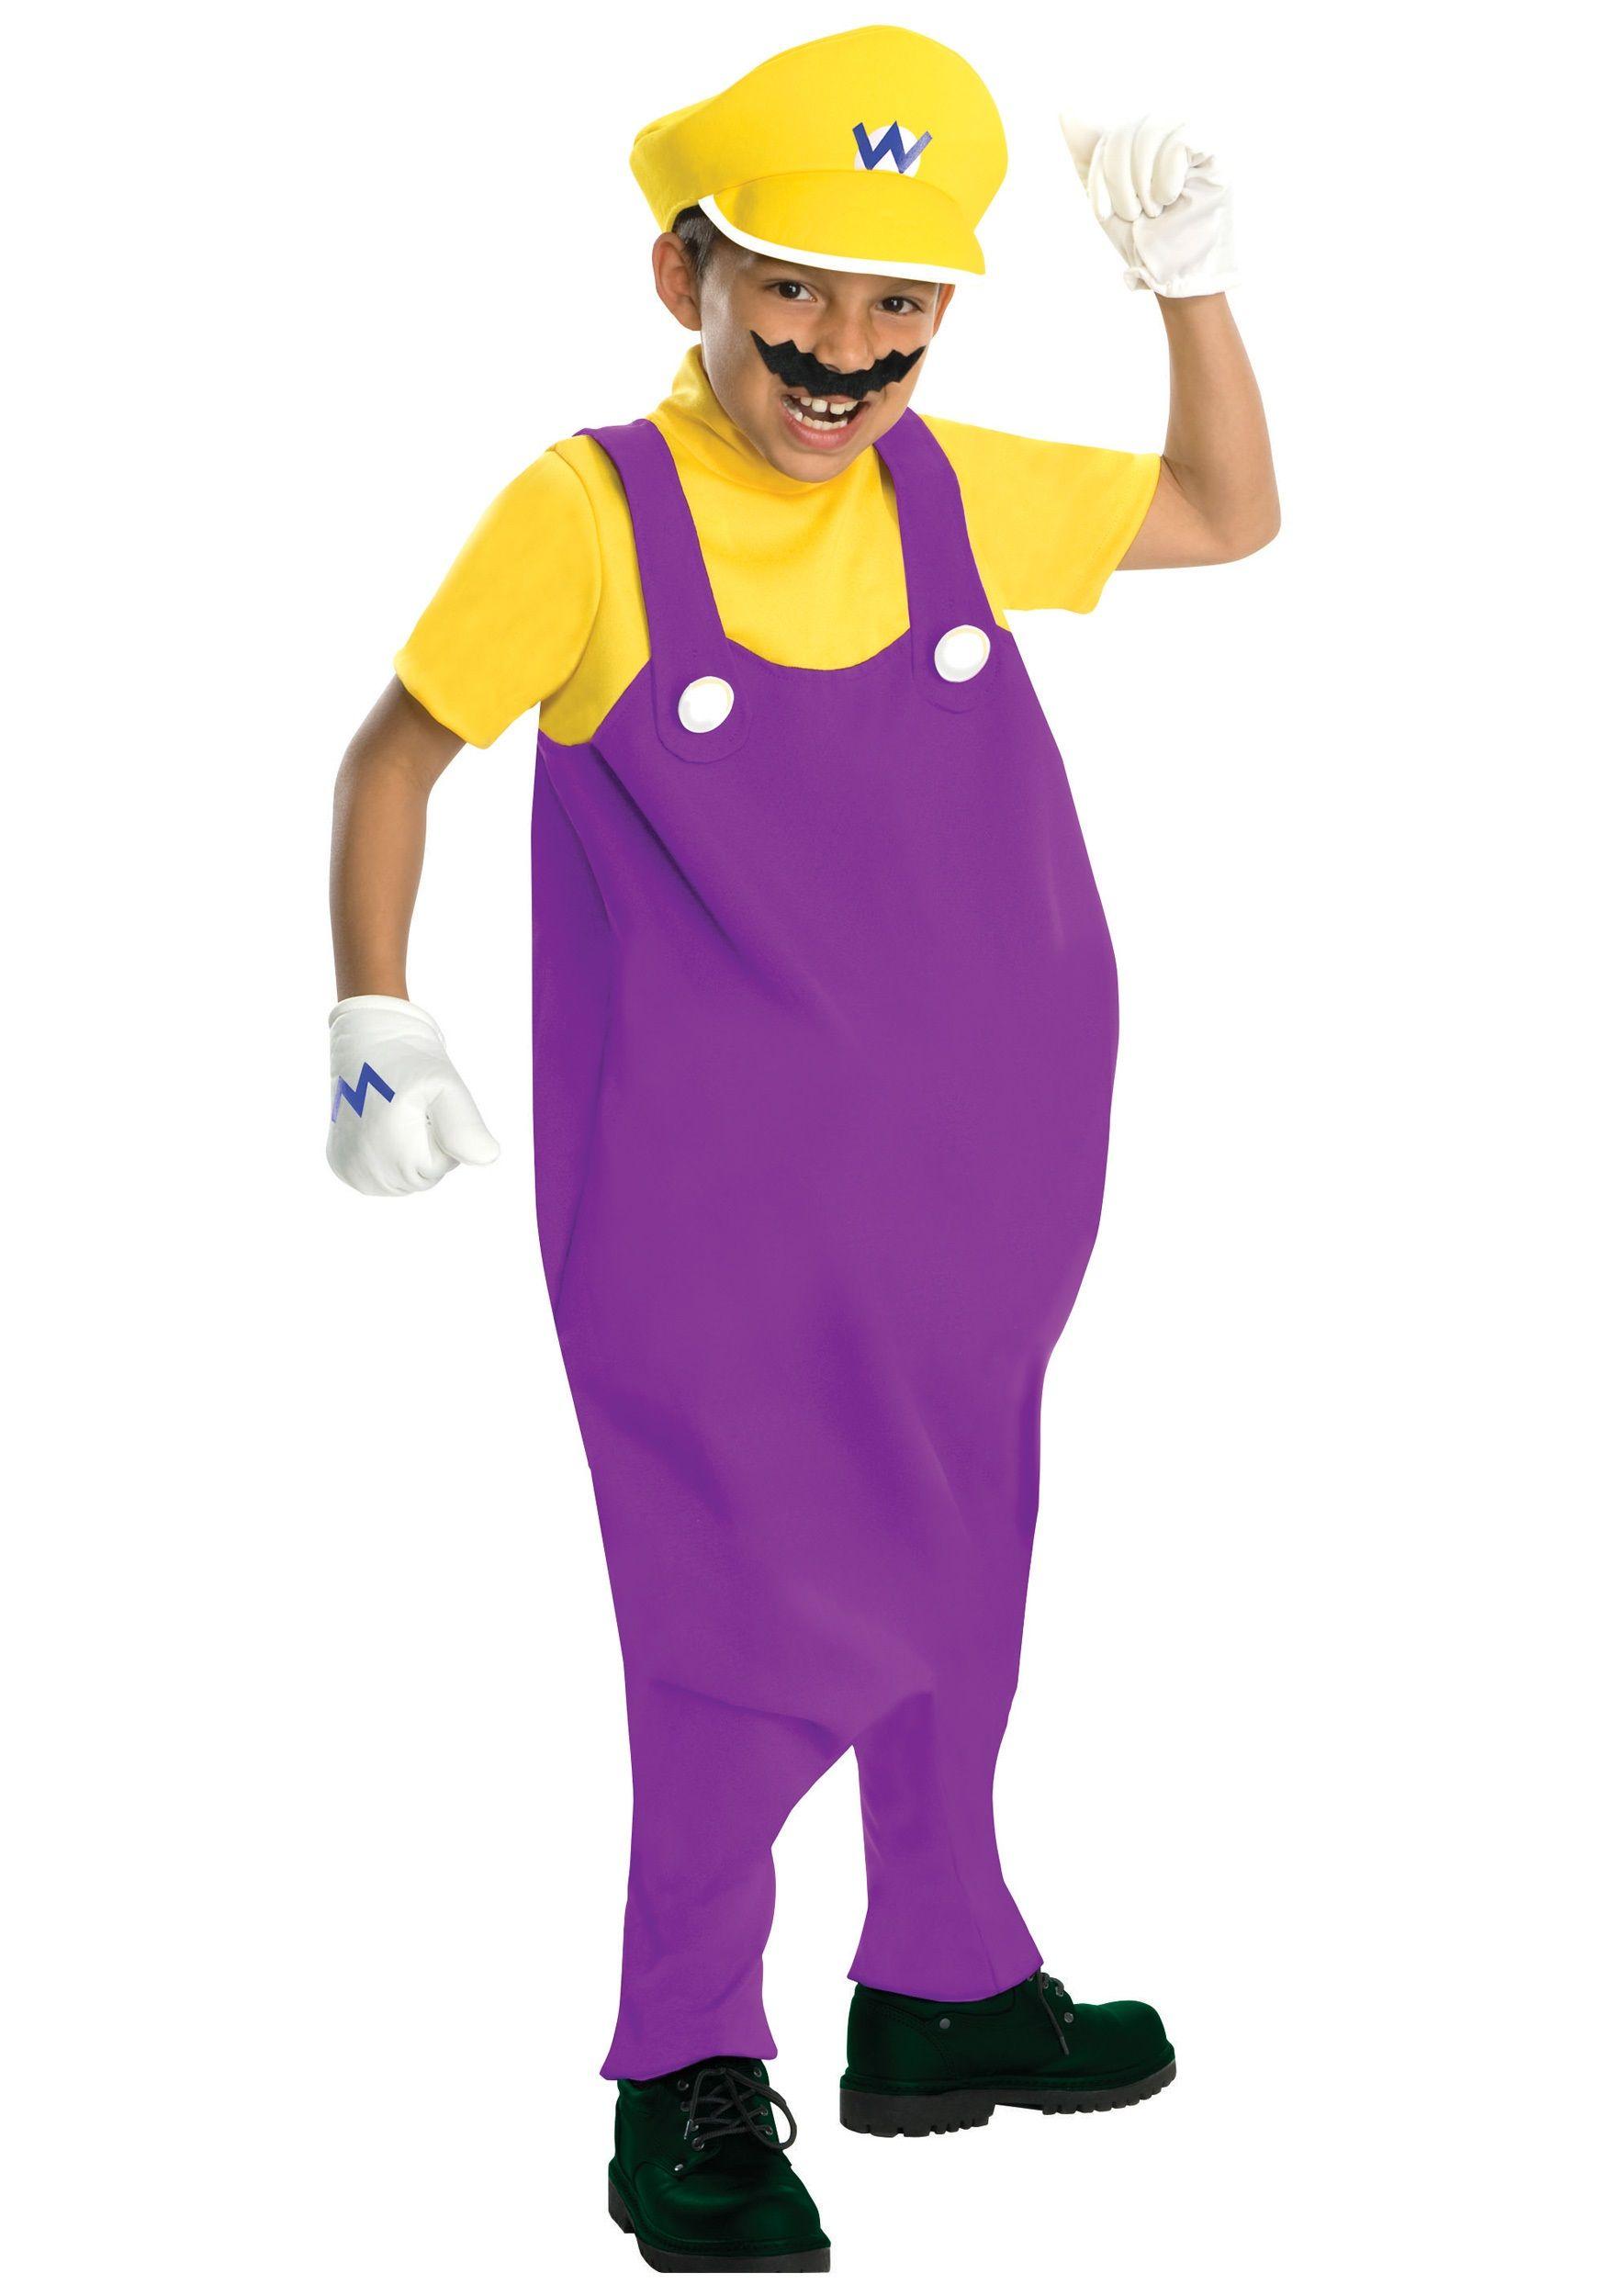 Deluxe Child Wario Costume   Wario costume, Costumes and Halloween ...